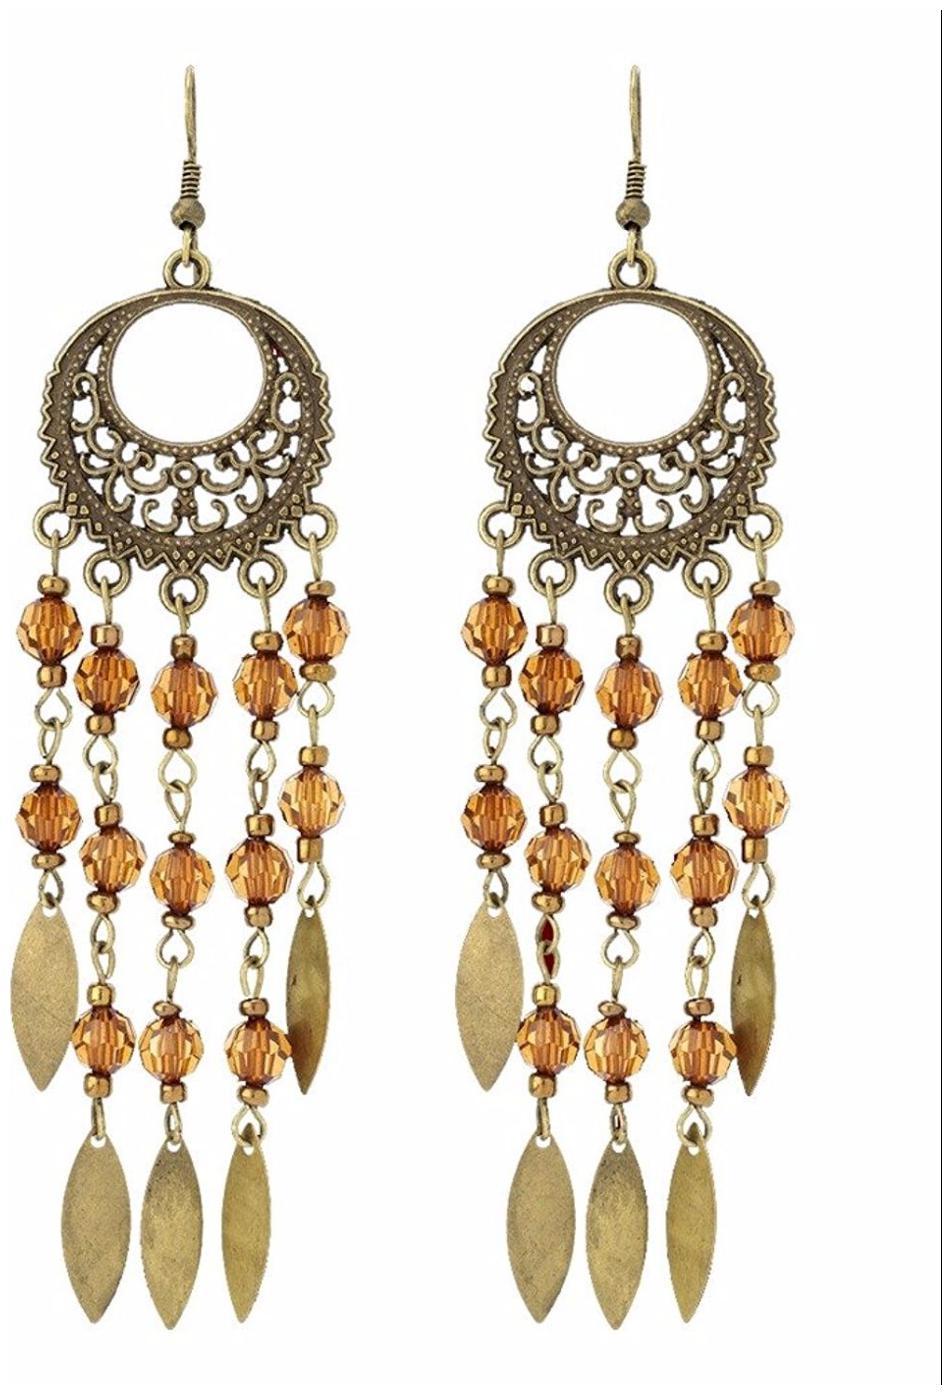 Best Cheap Good 100 Authentic Apriati Earrings